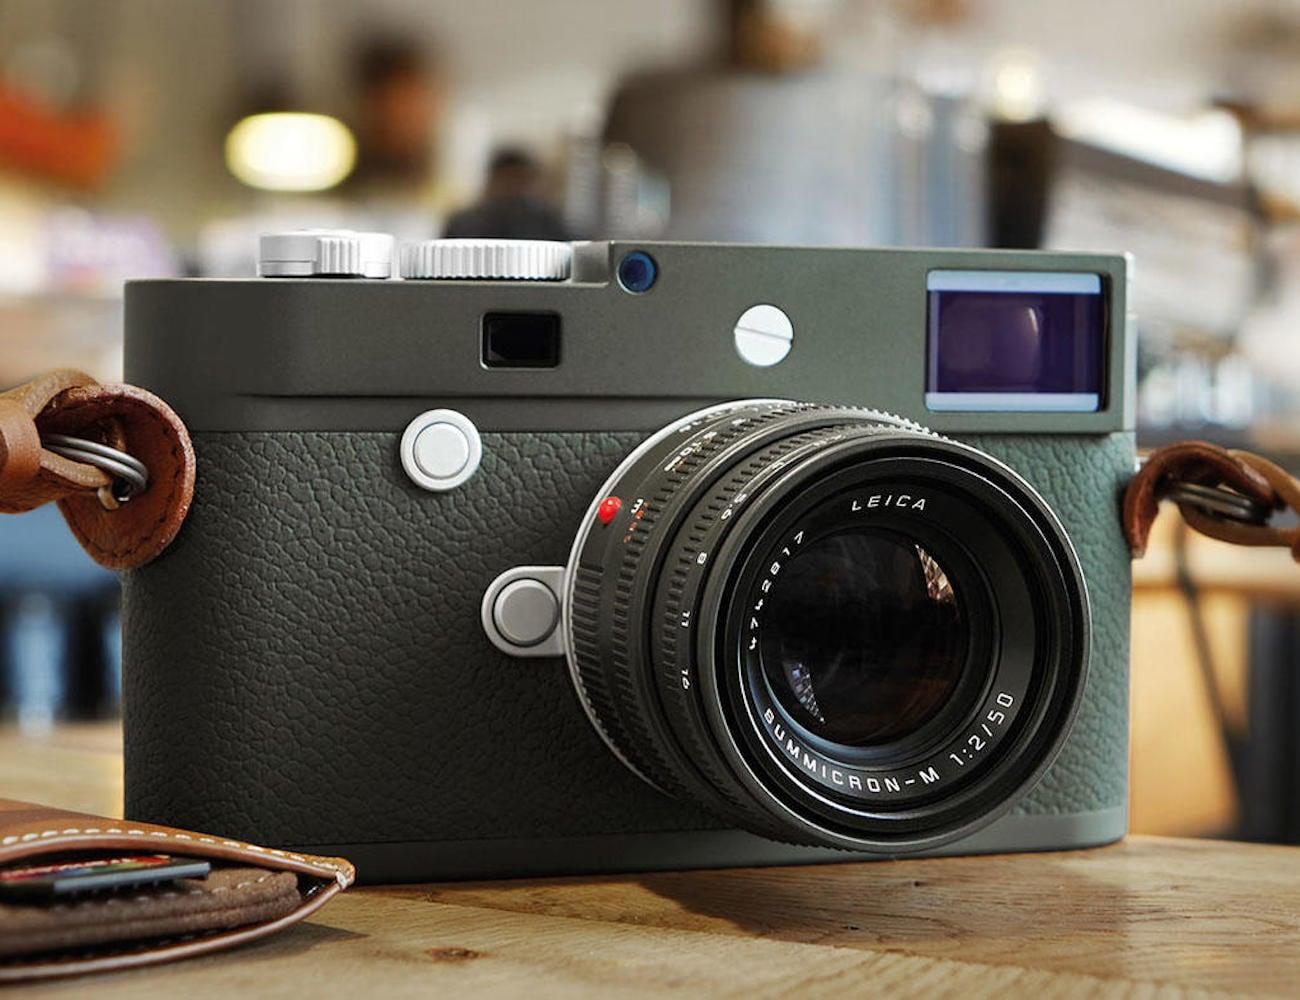 Leica M10 Upgrade